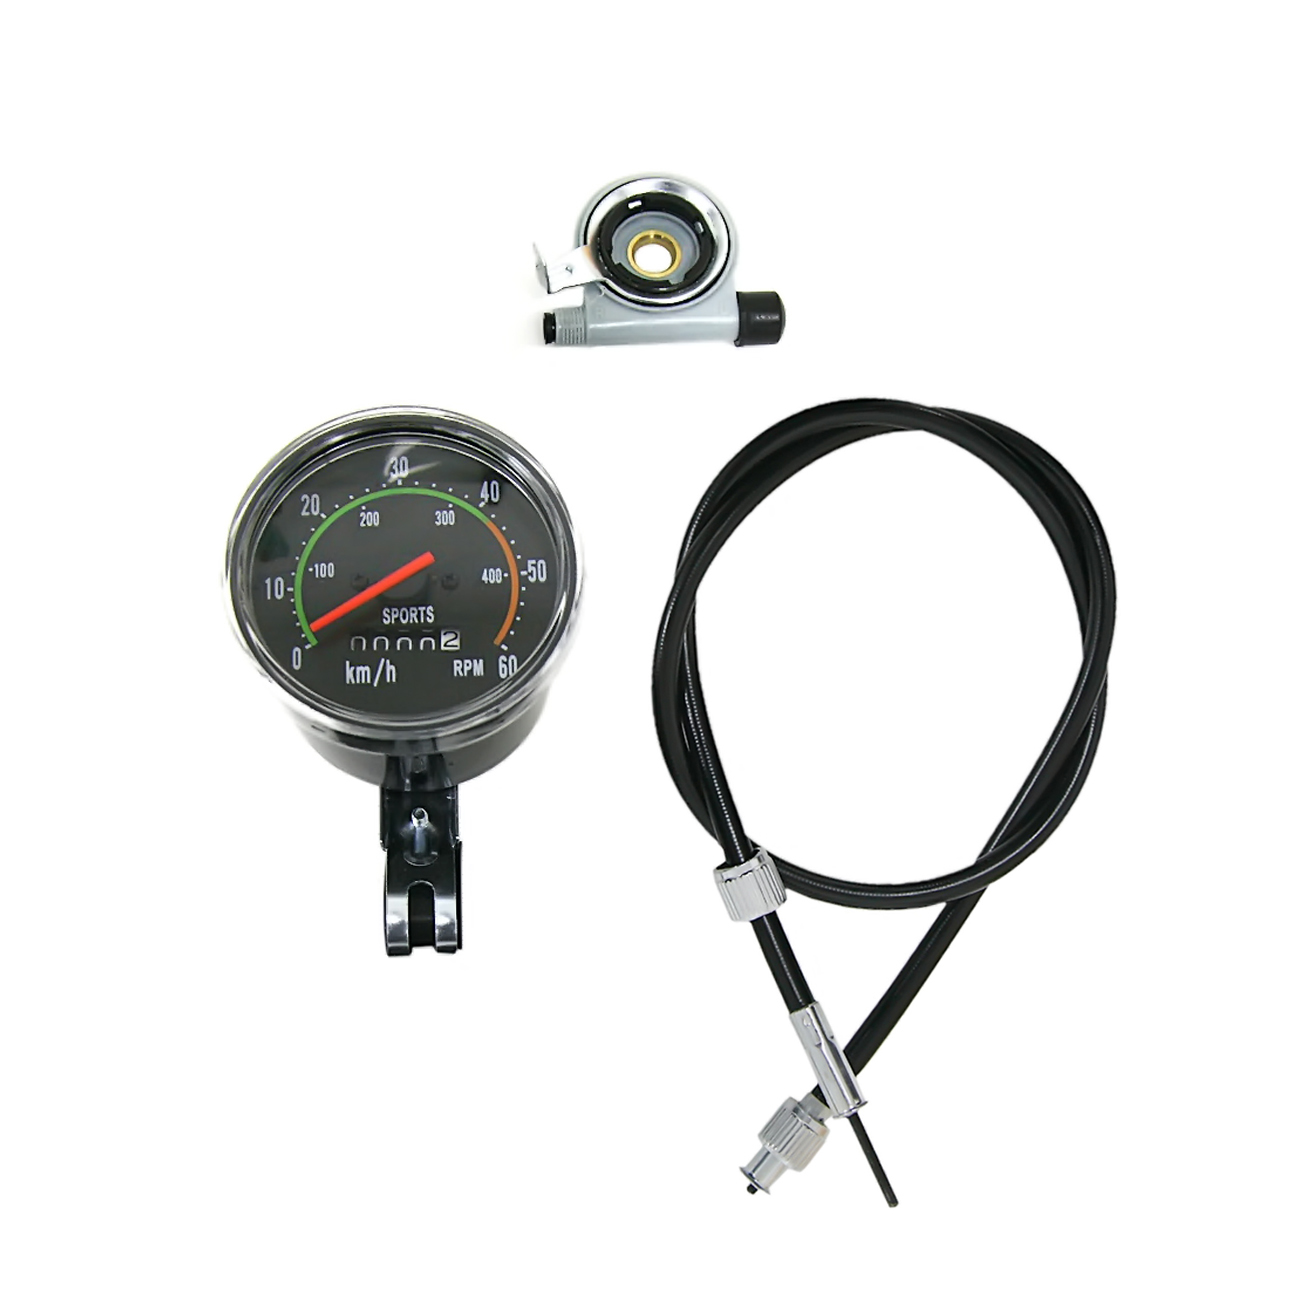 Velocímetro y odómetro con Hardware de montaje para Motor de bicicleta motorizado de 80cc